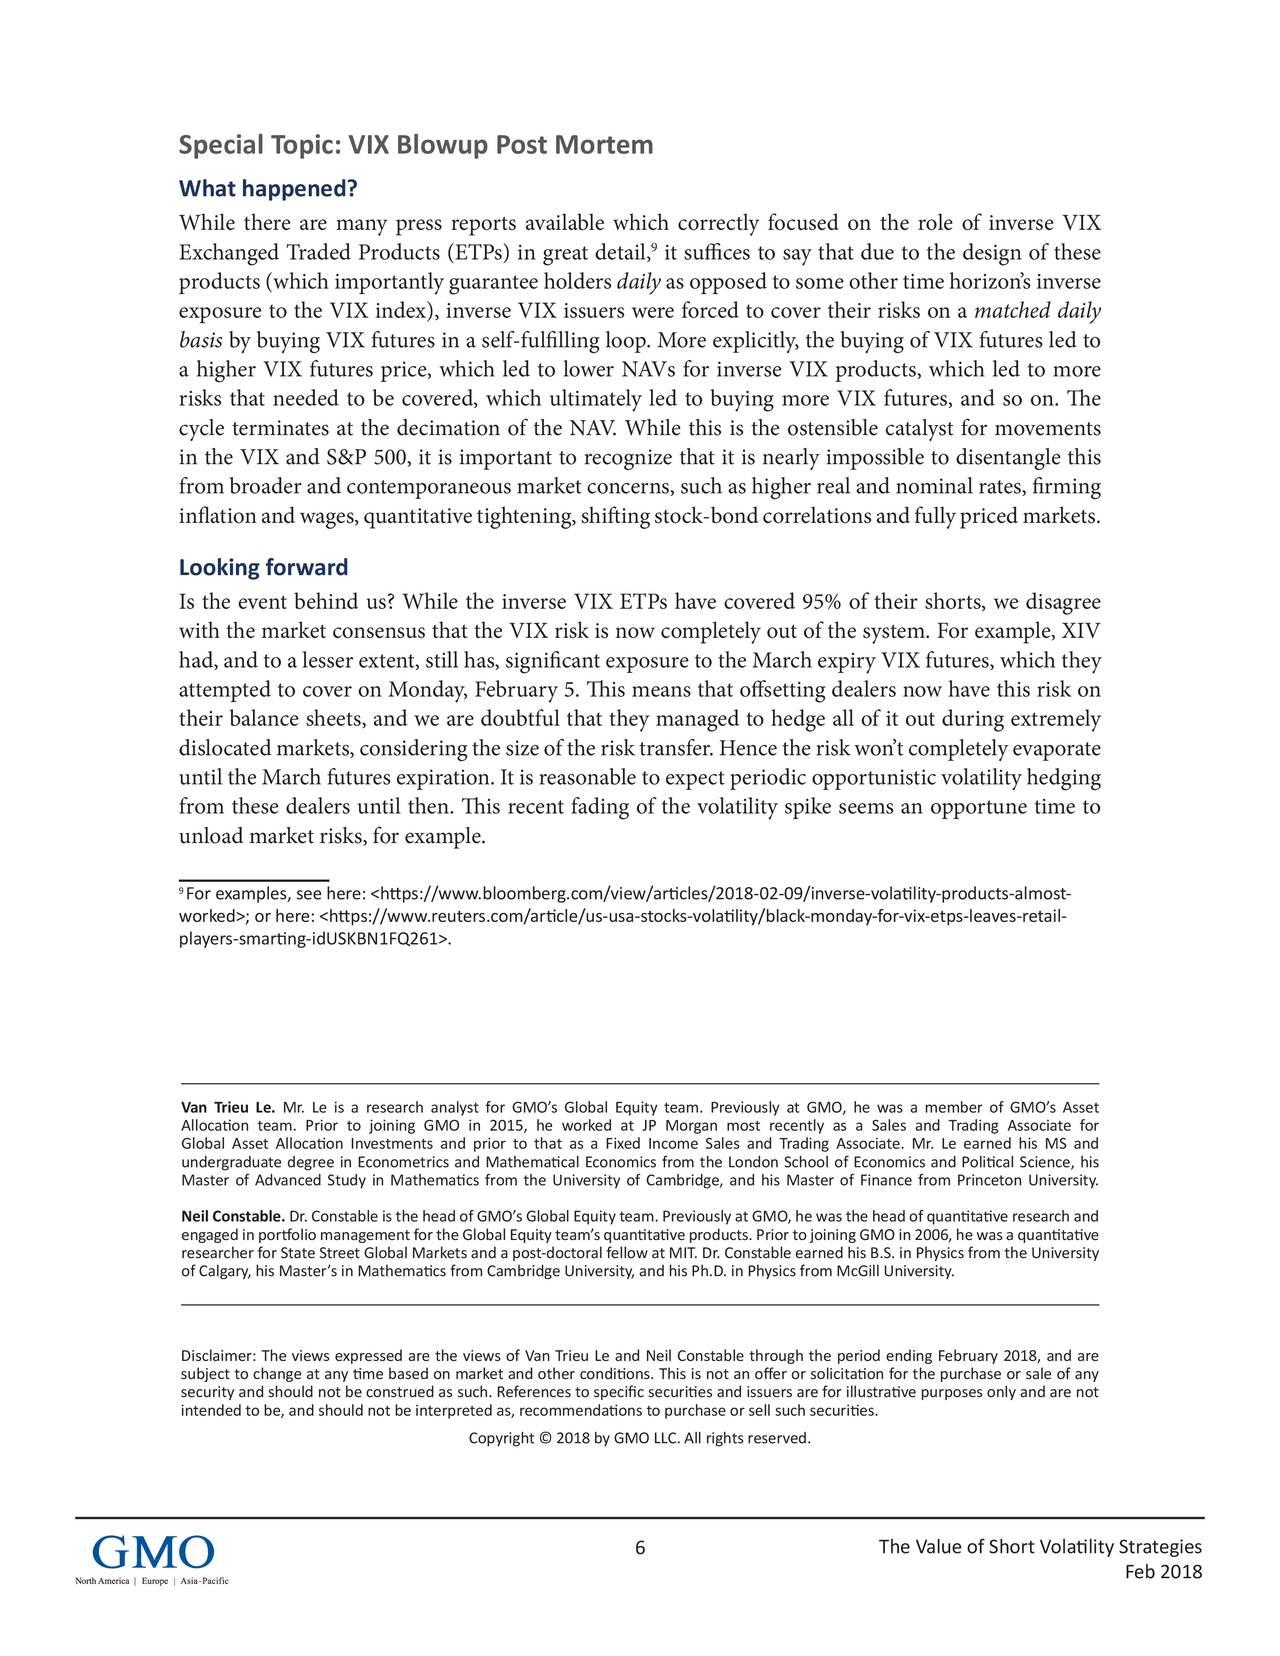 The Value Of Short Volatility Strategies Seeking Alpha